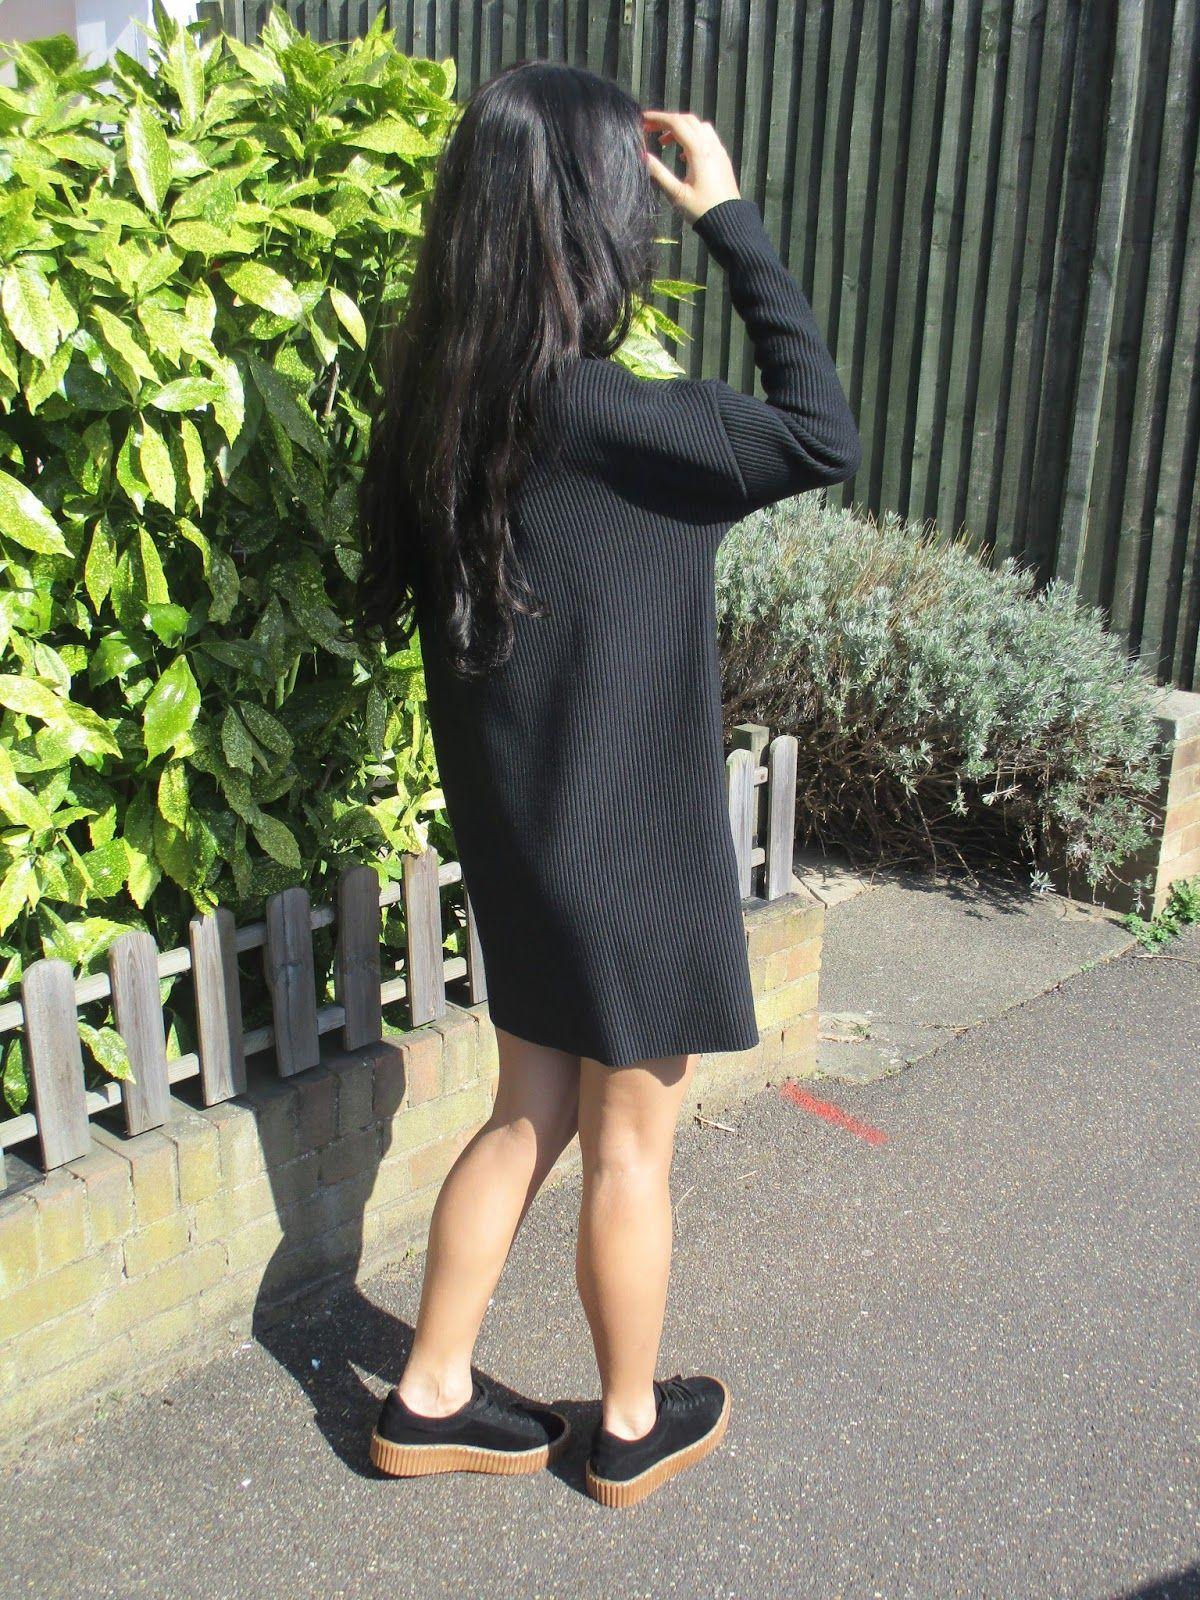 Back to Black - D A R C Y D I O N Y V E S - fashion and feminism blog